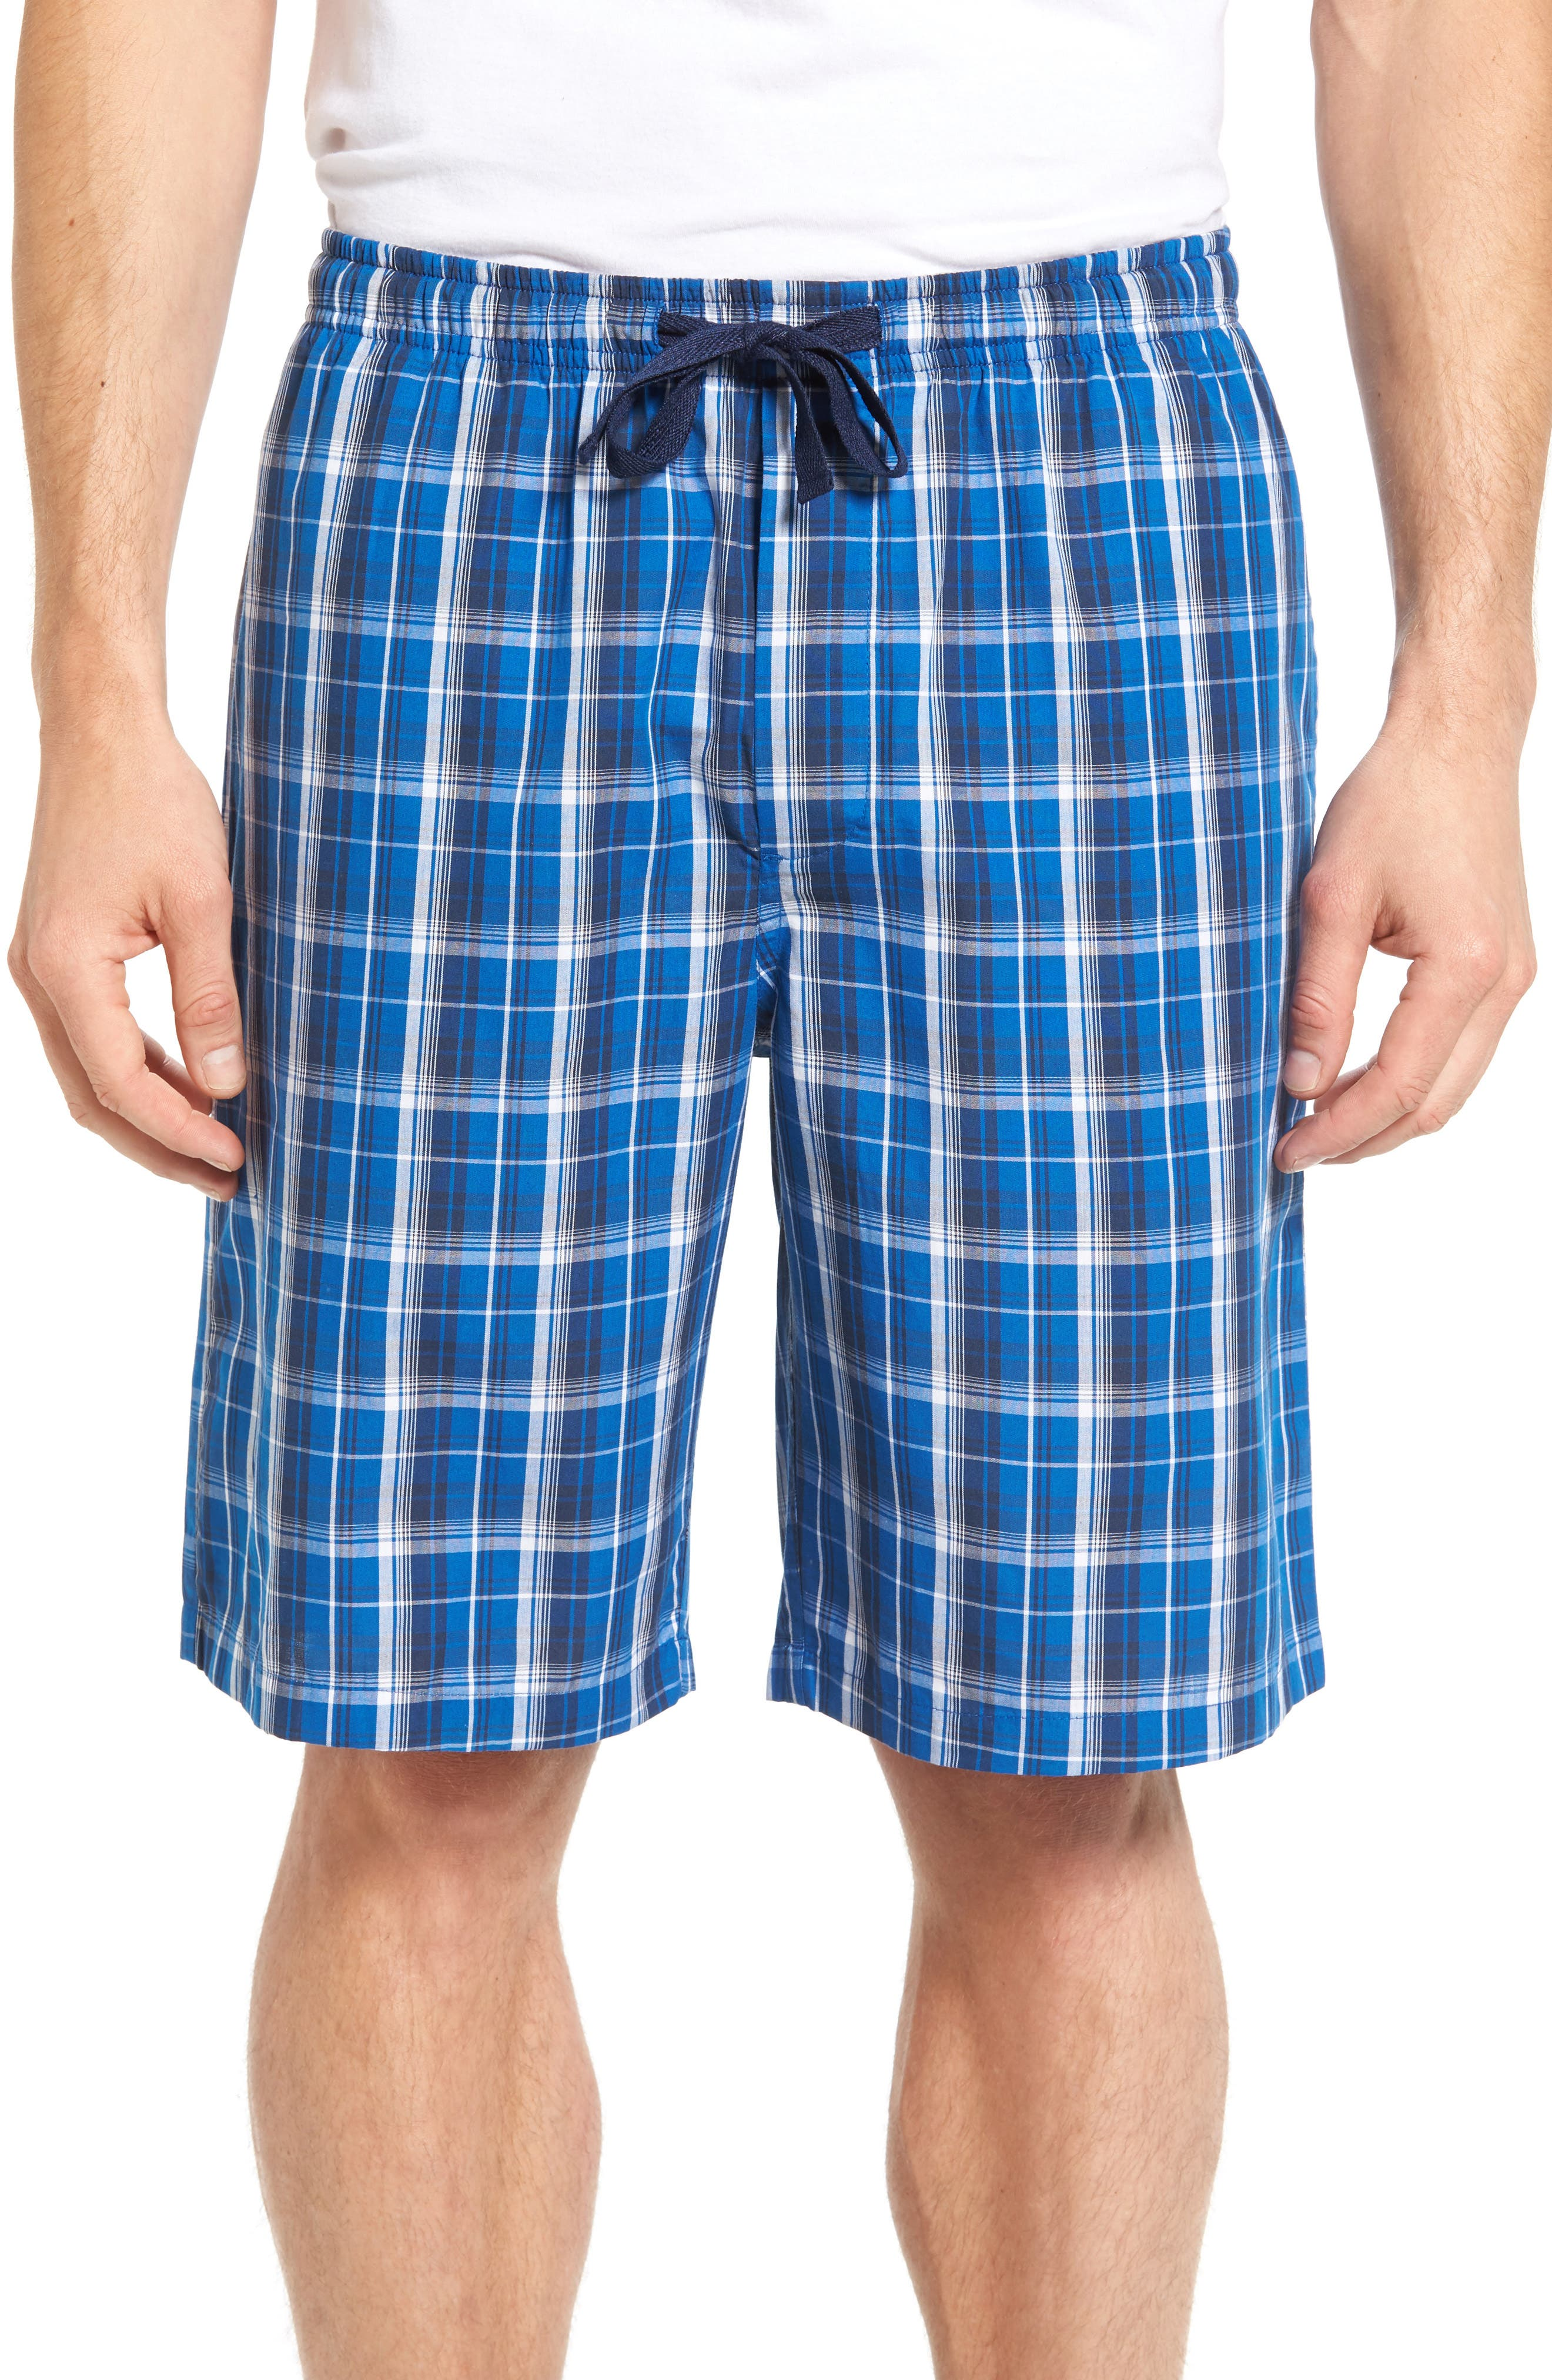 Nordstrom Men's Shop Poplin Lounge Shorts